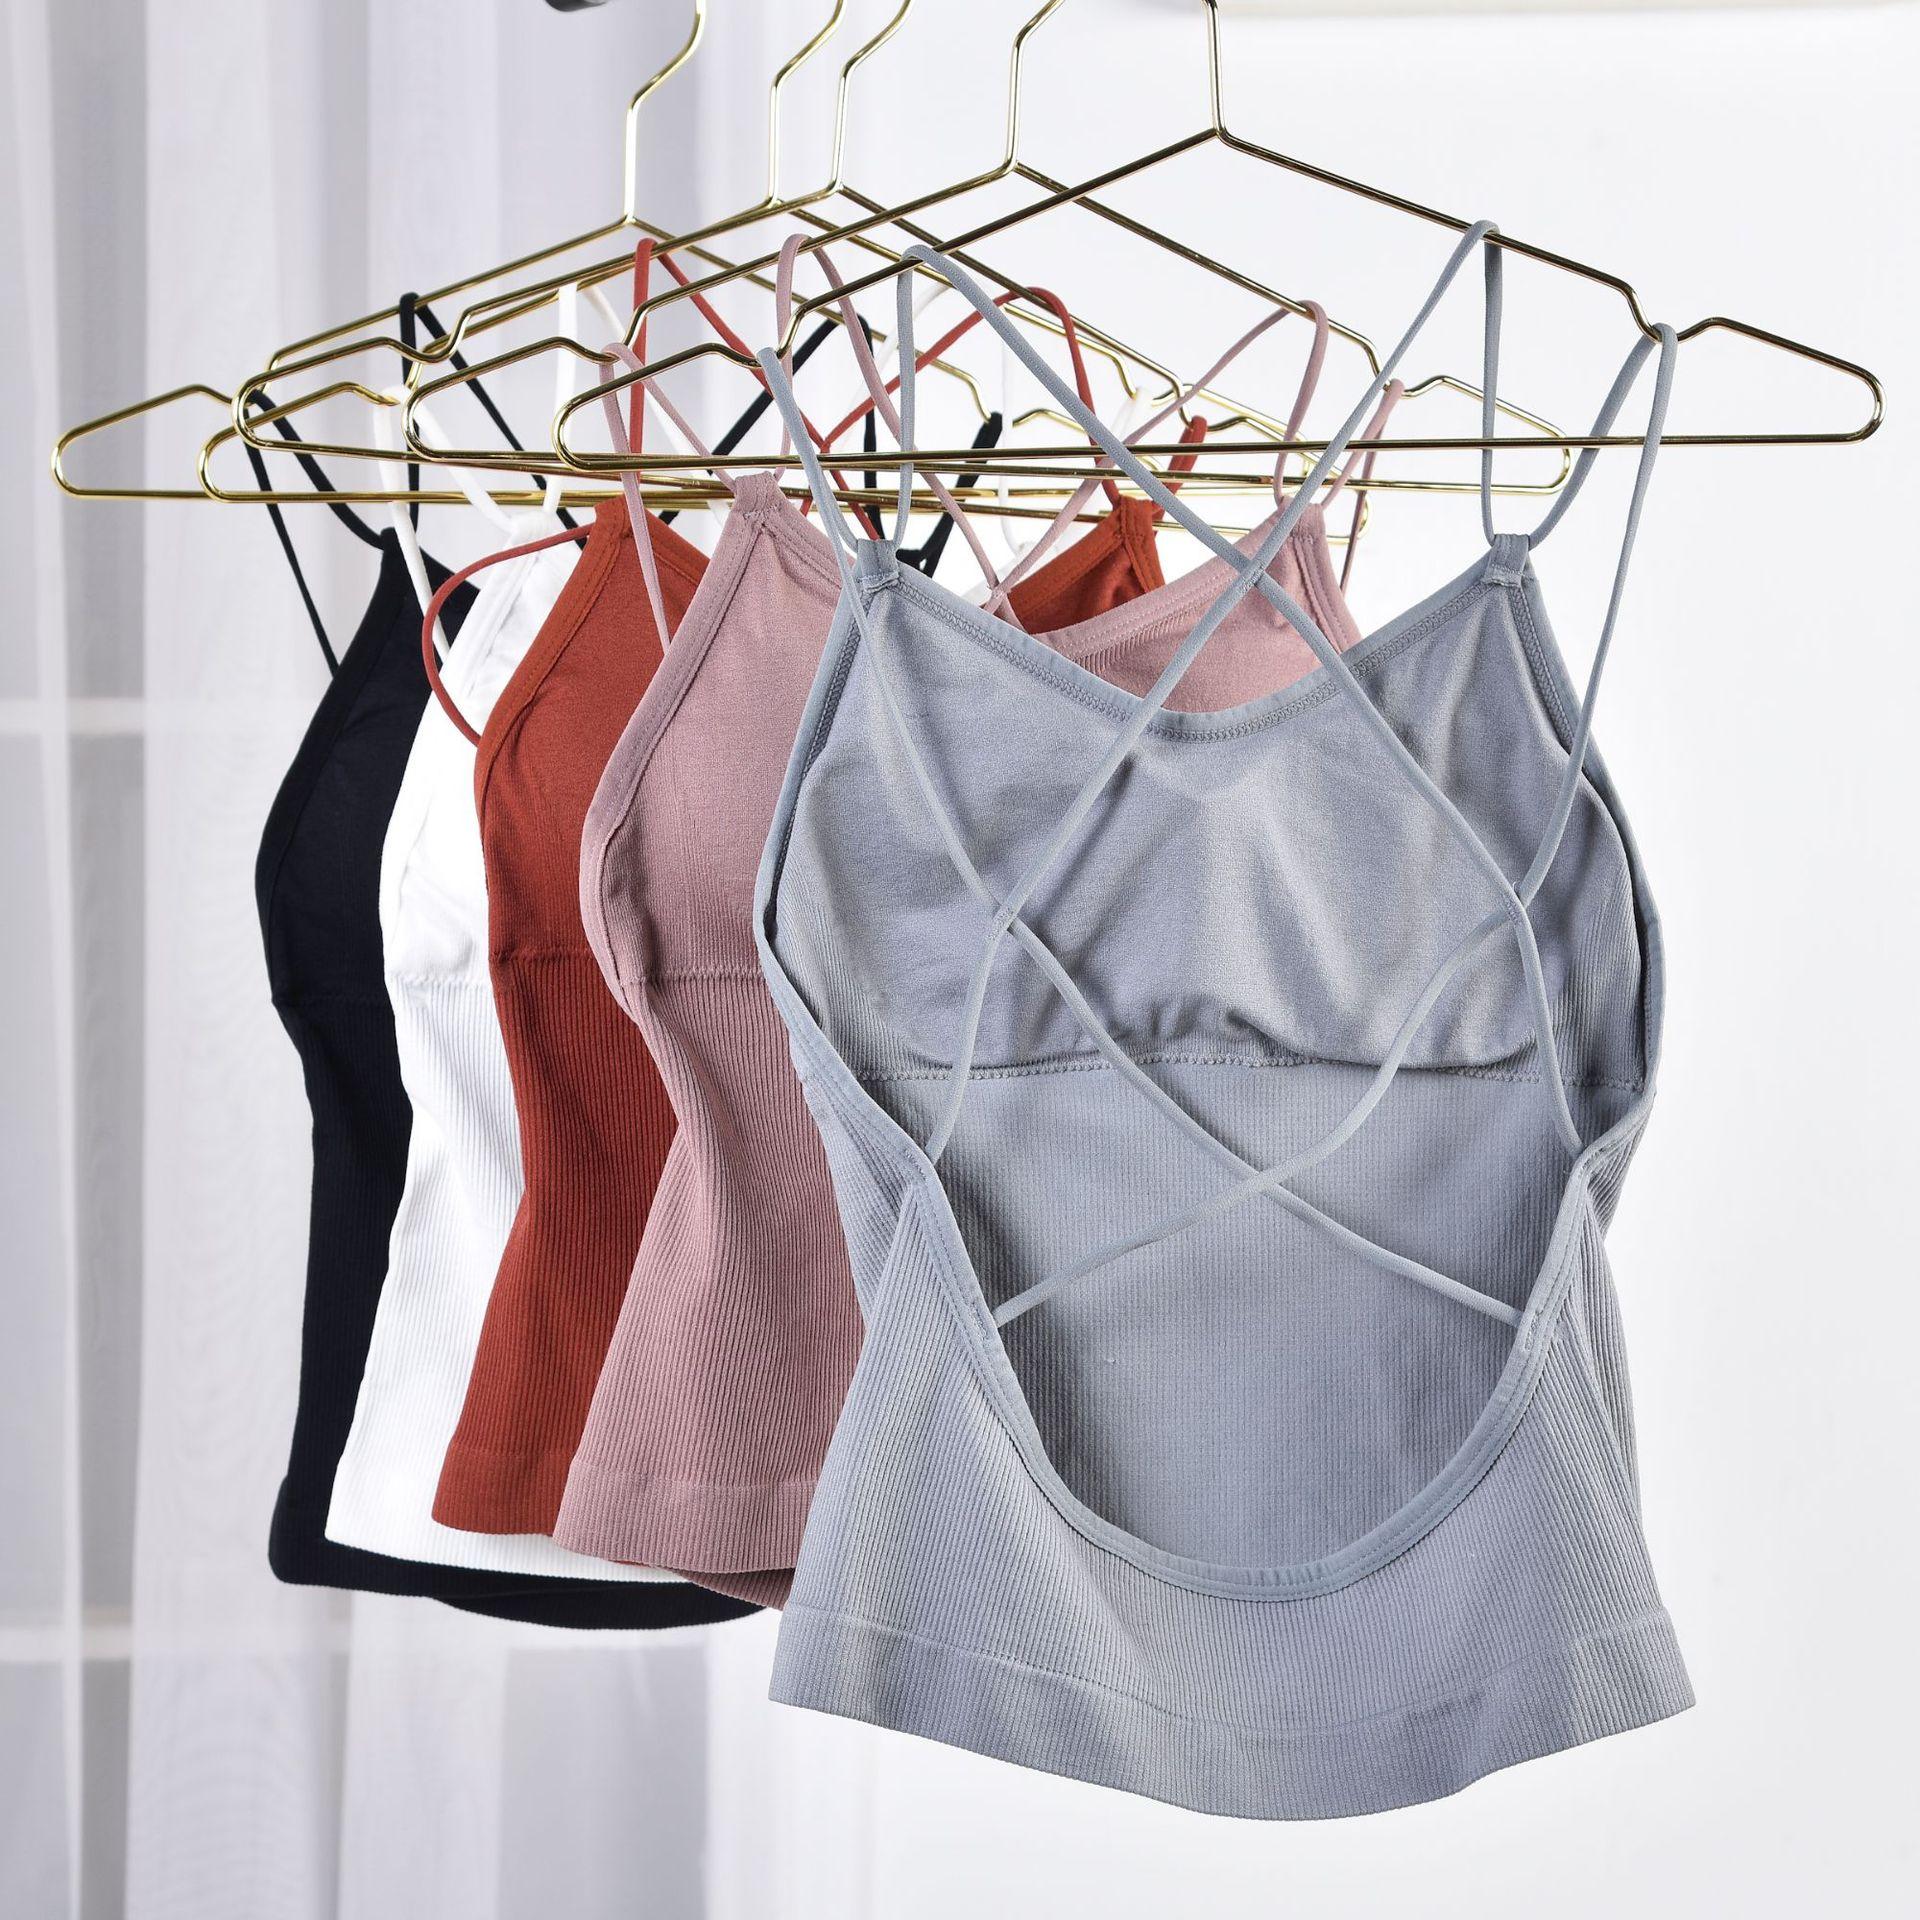 Cross Back Camis Top Women Vest Tank Tops Summer Sleeveless Camisole Women Cropped Camis Top Comfort Underwear Slinky Padded Top